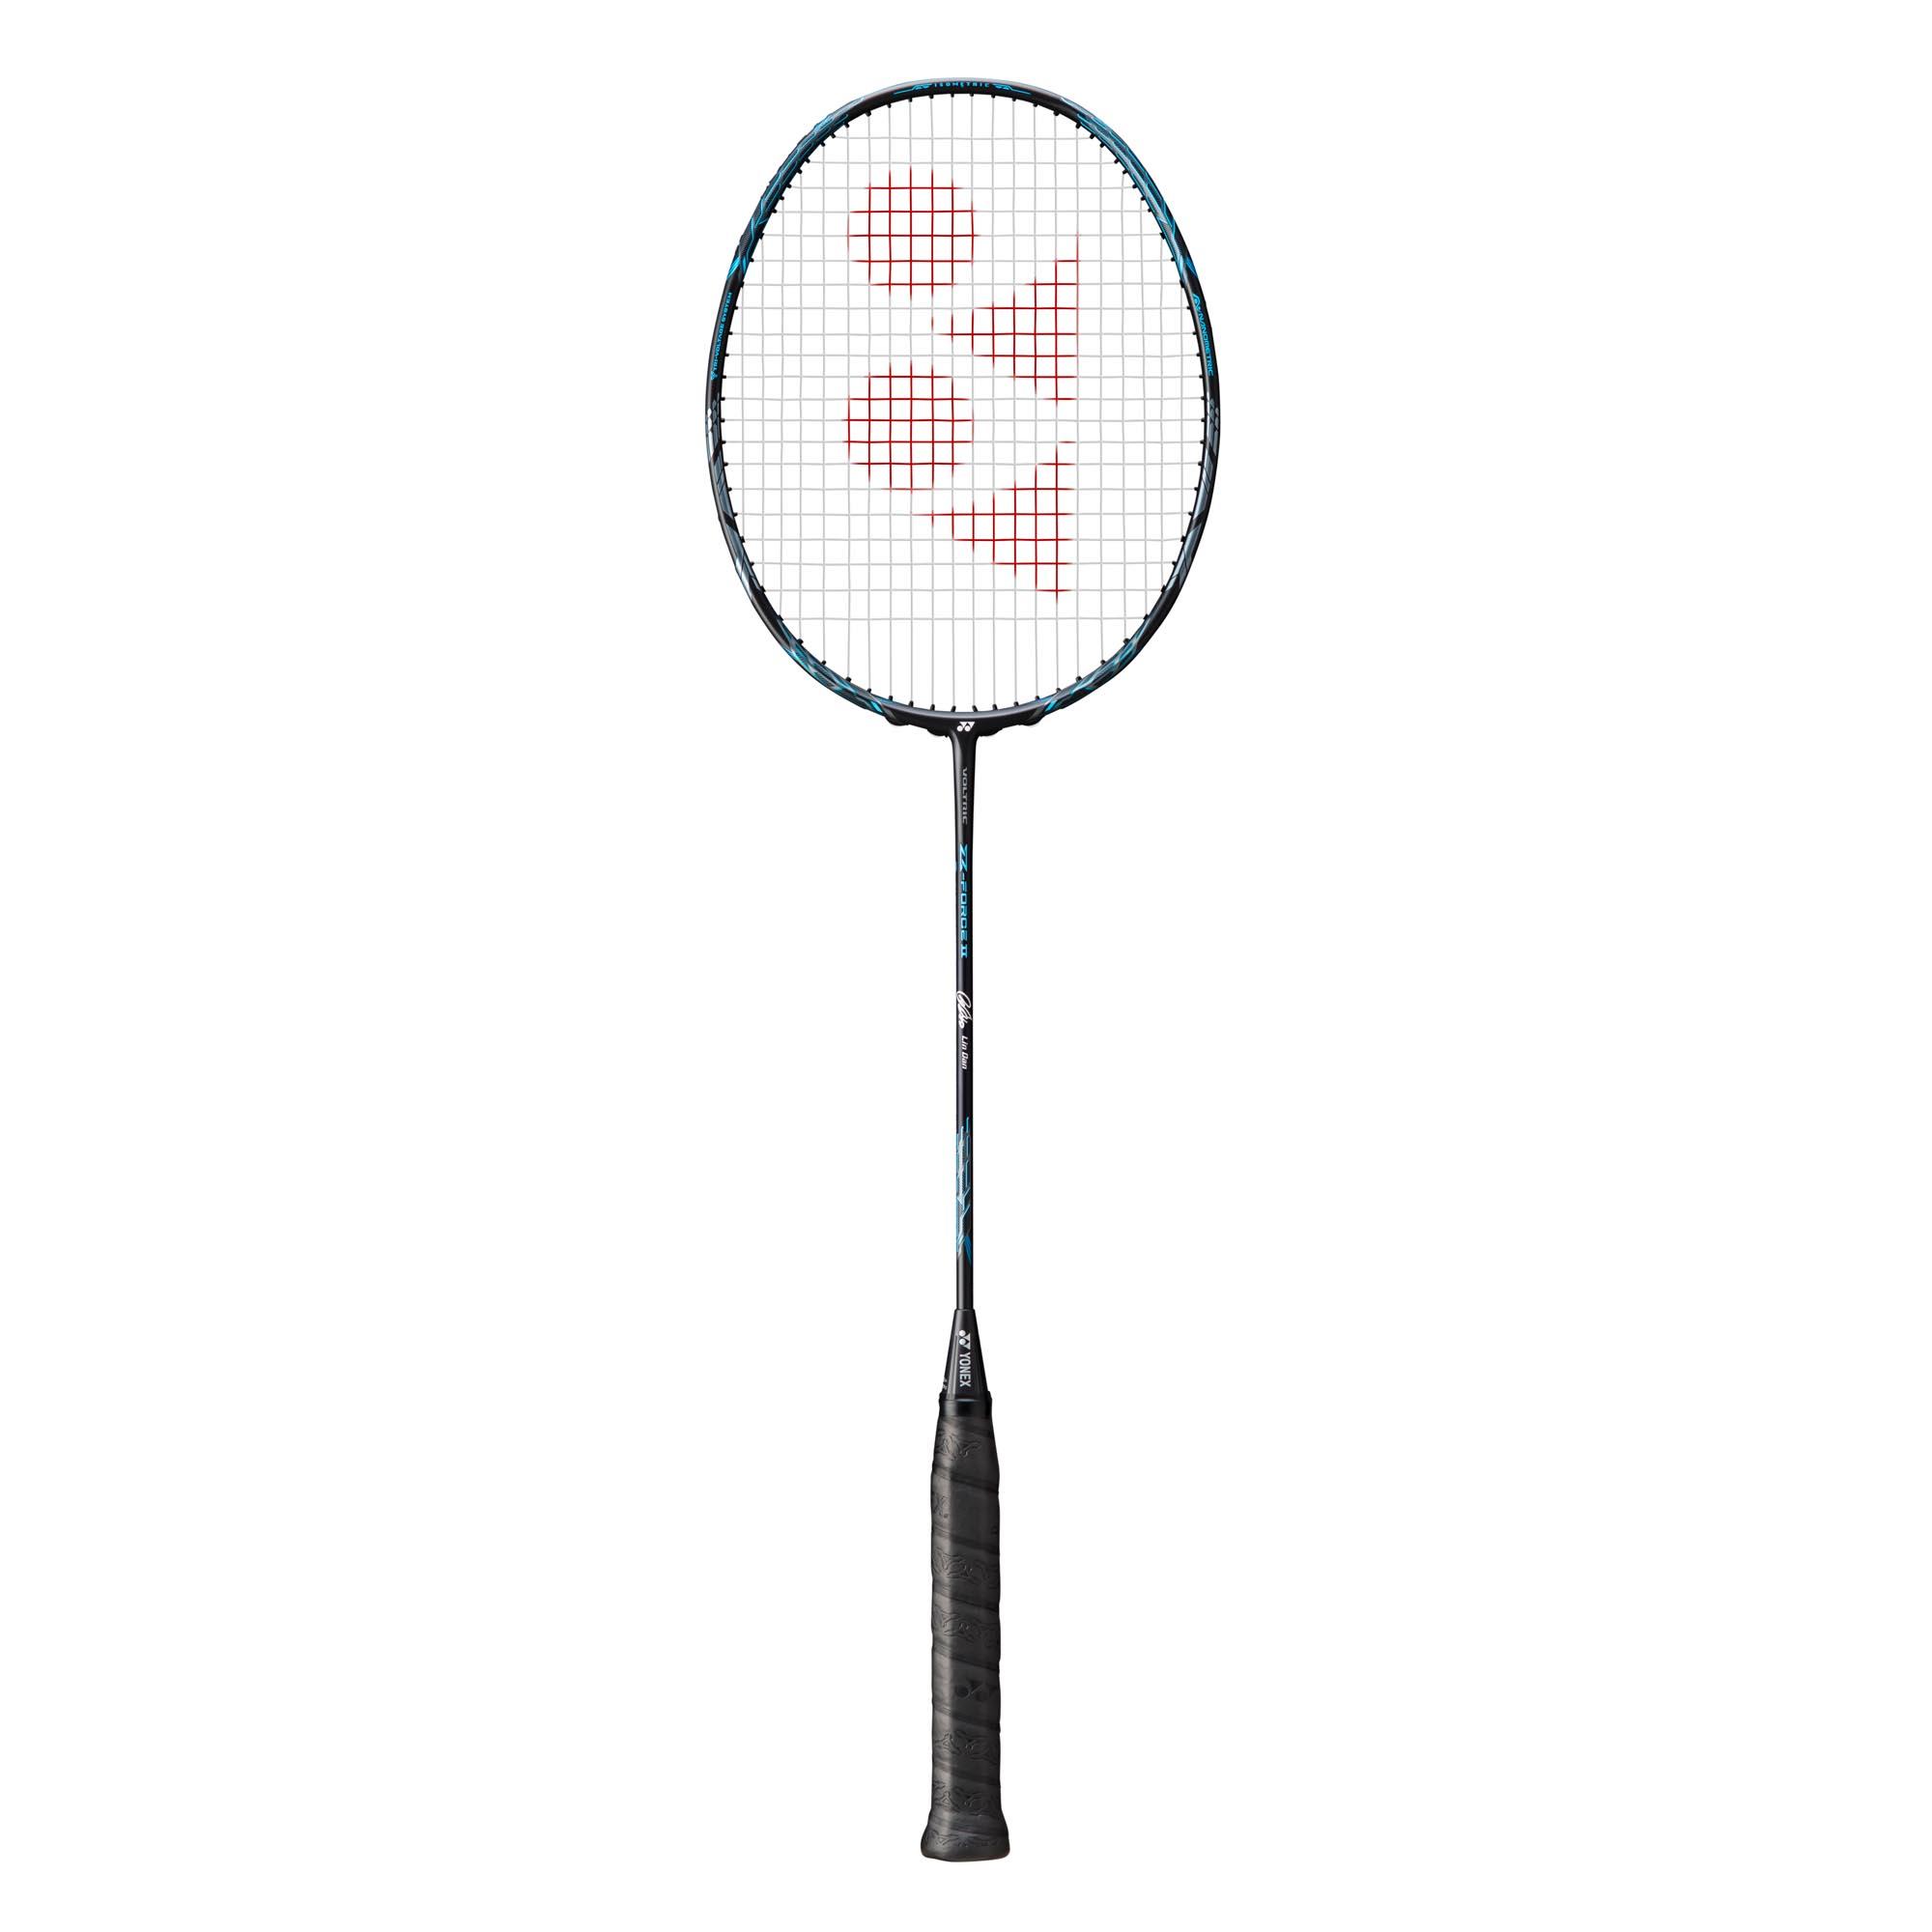 Yonex Voltric ZForce II LV Lin Dan Badminton Racket